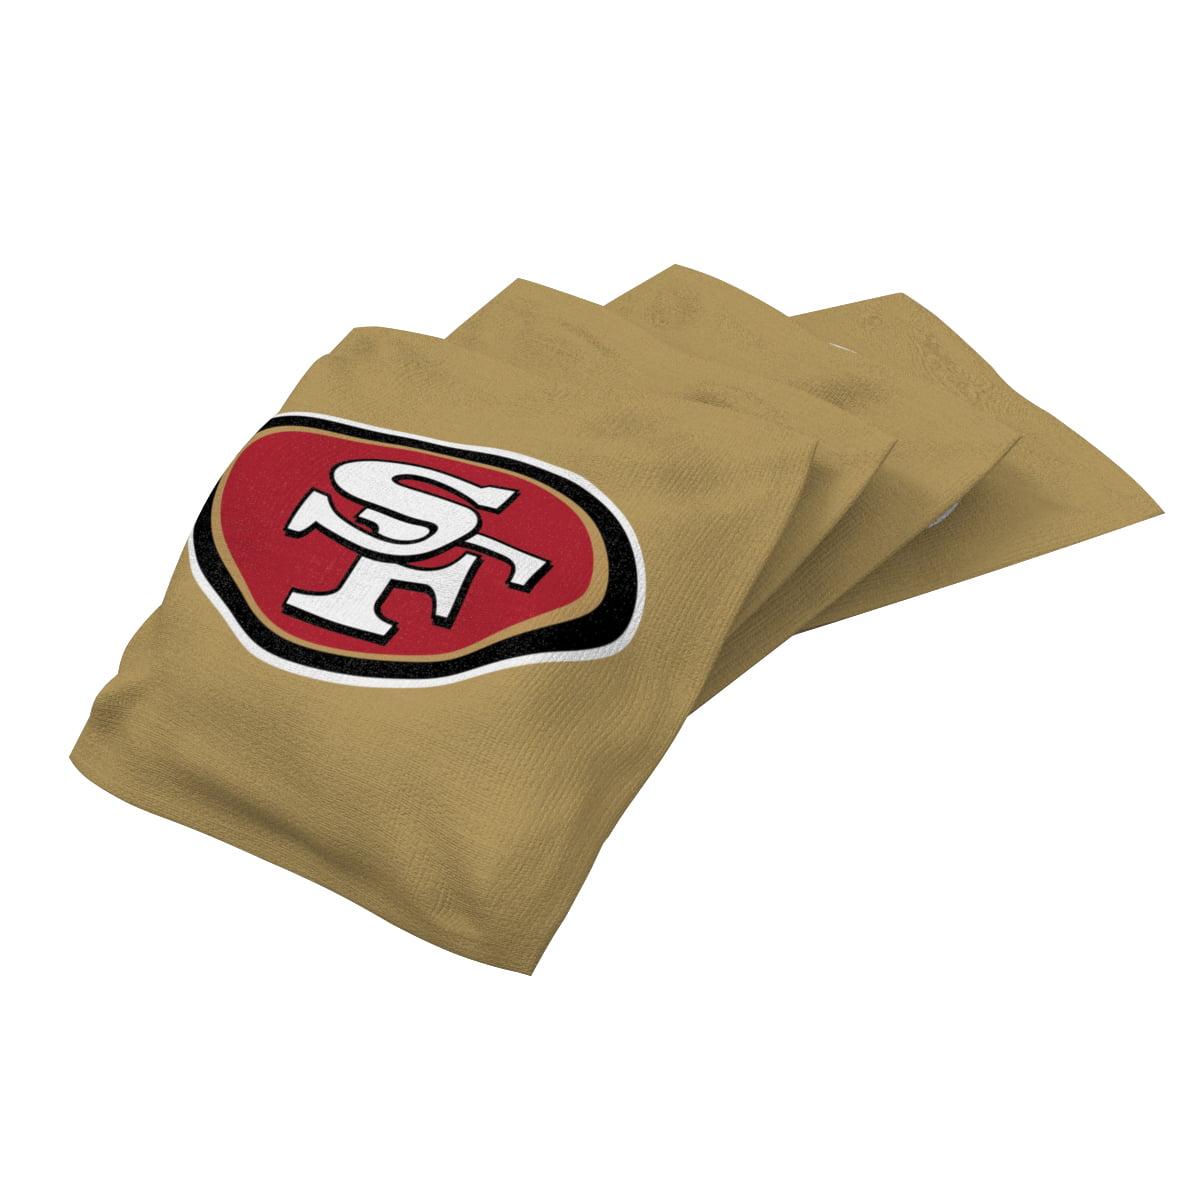 XL Bean Bag 4pk Green Bay Packers Yellow